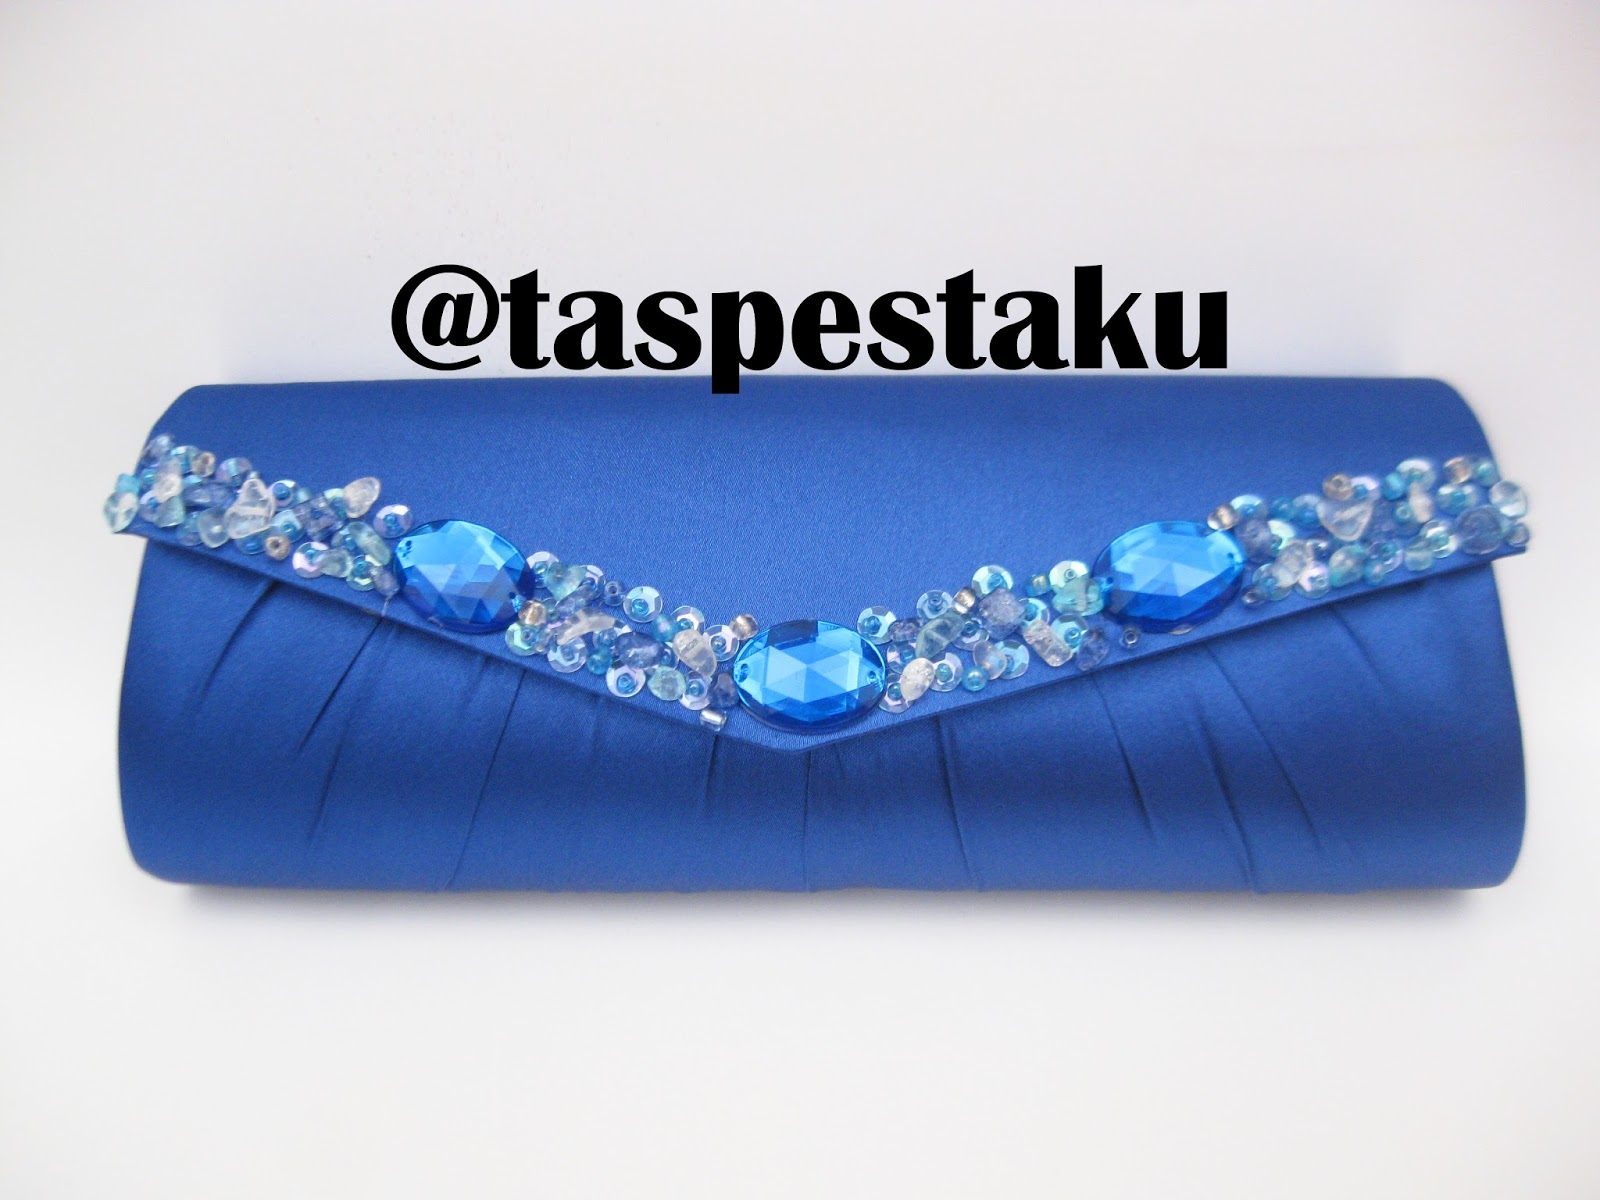 Handmade Clutch Bag Lucu Unik Biru ELektrik. TAS PESTA - CLUTCH BAG ... d154b86dd8